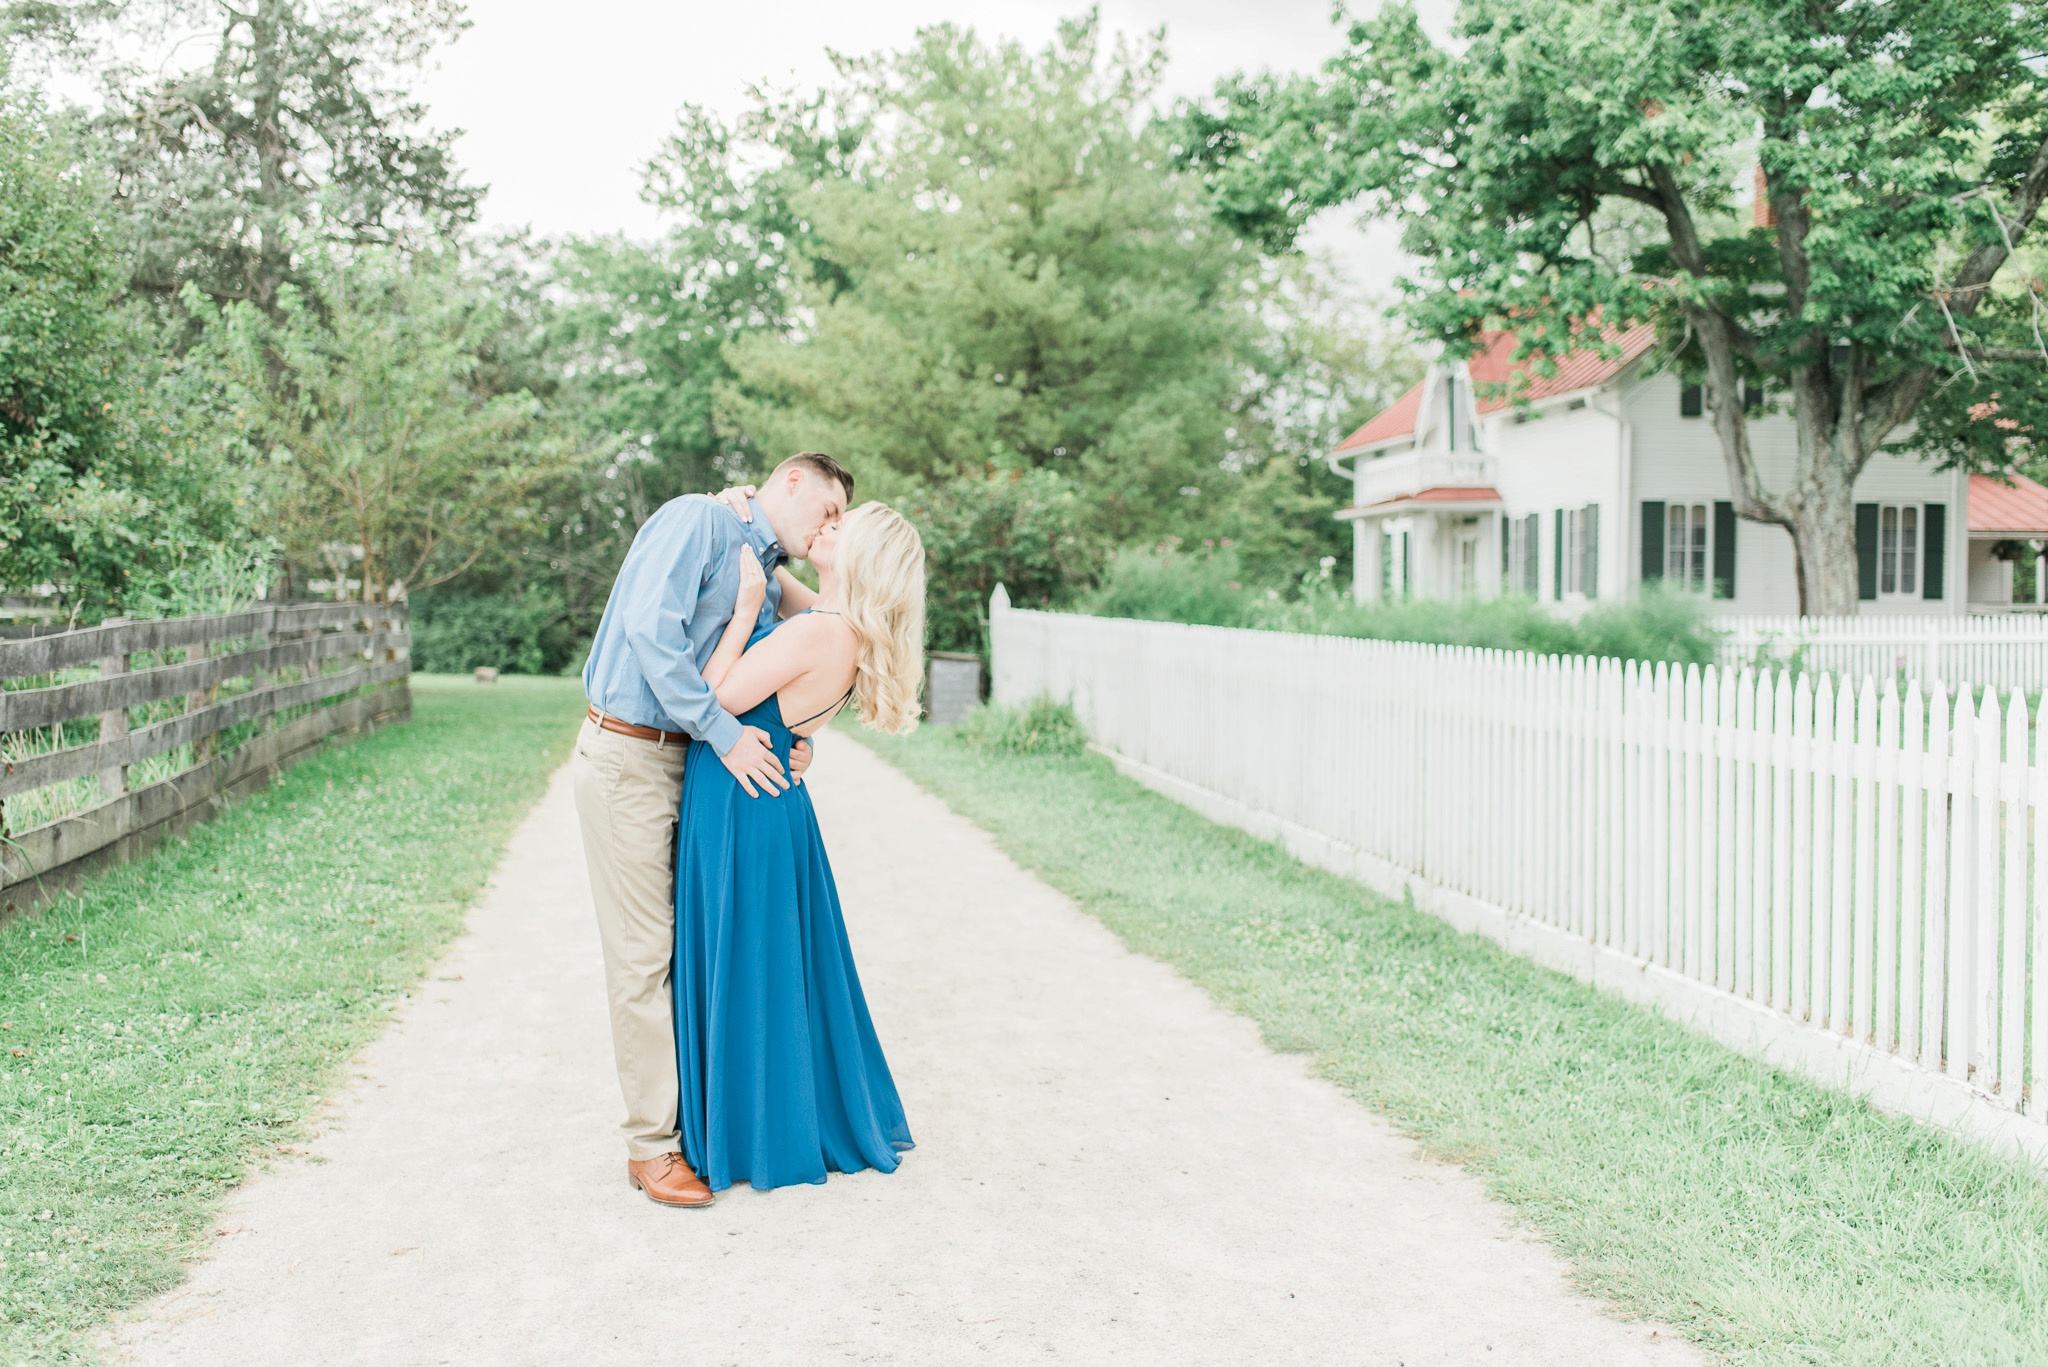 slate-run-metro-park-engagement-columbus-wedding-photographer-1.jpg